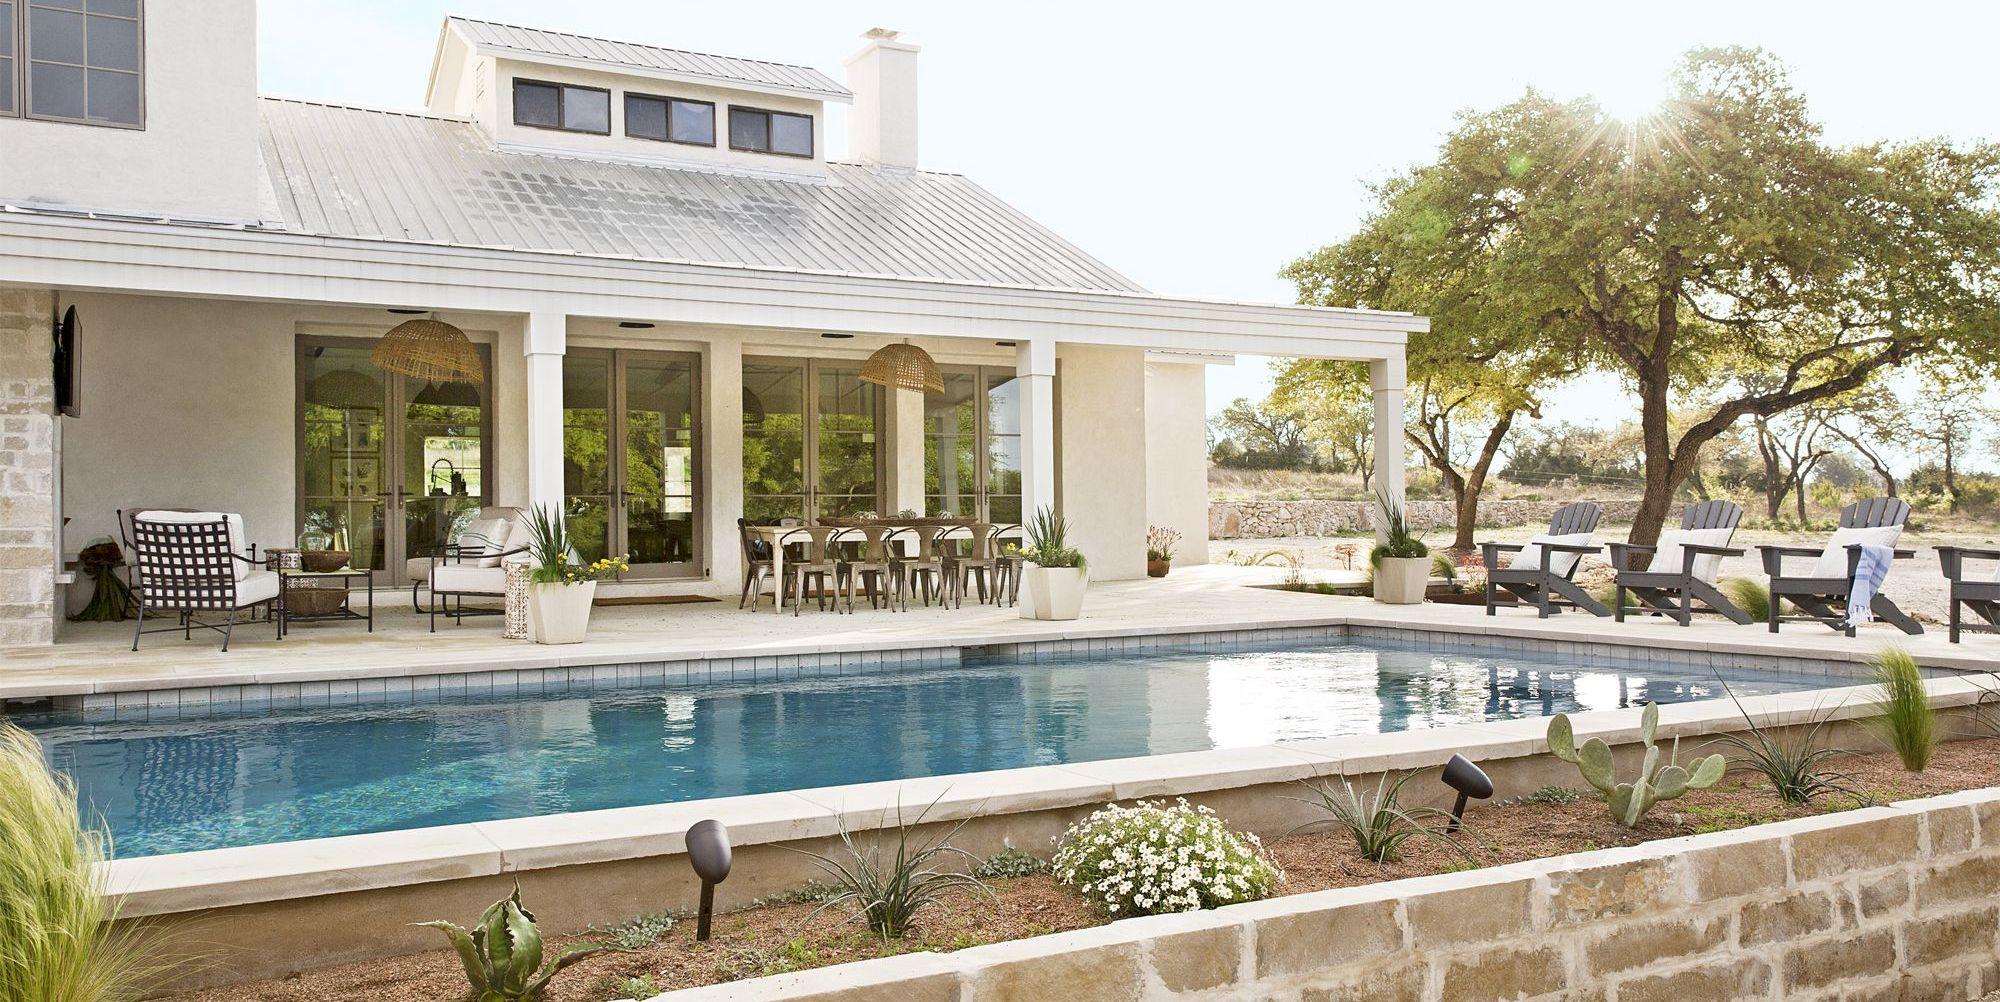 Best Backyard Design 18 best swimming pool designs - unique swimming pool design ideas